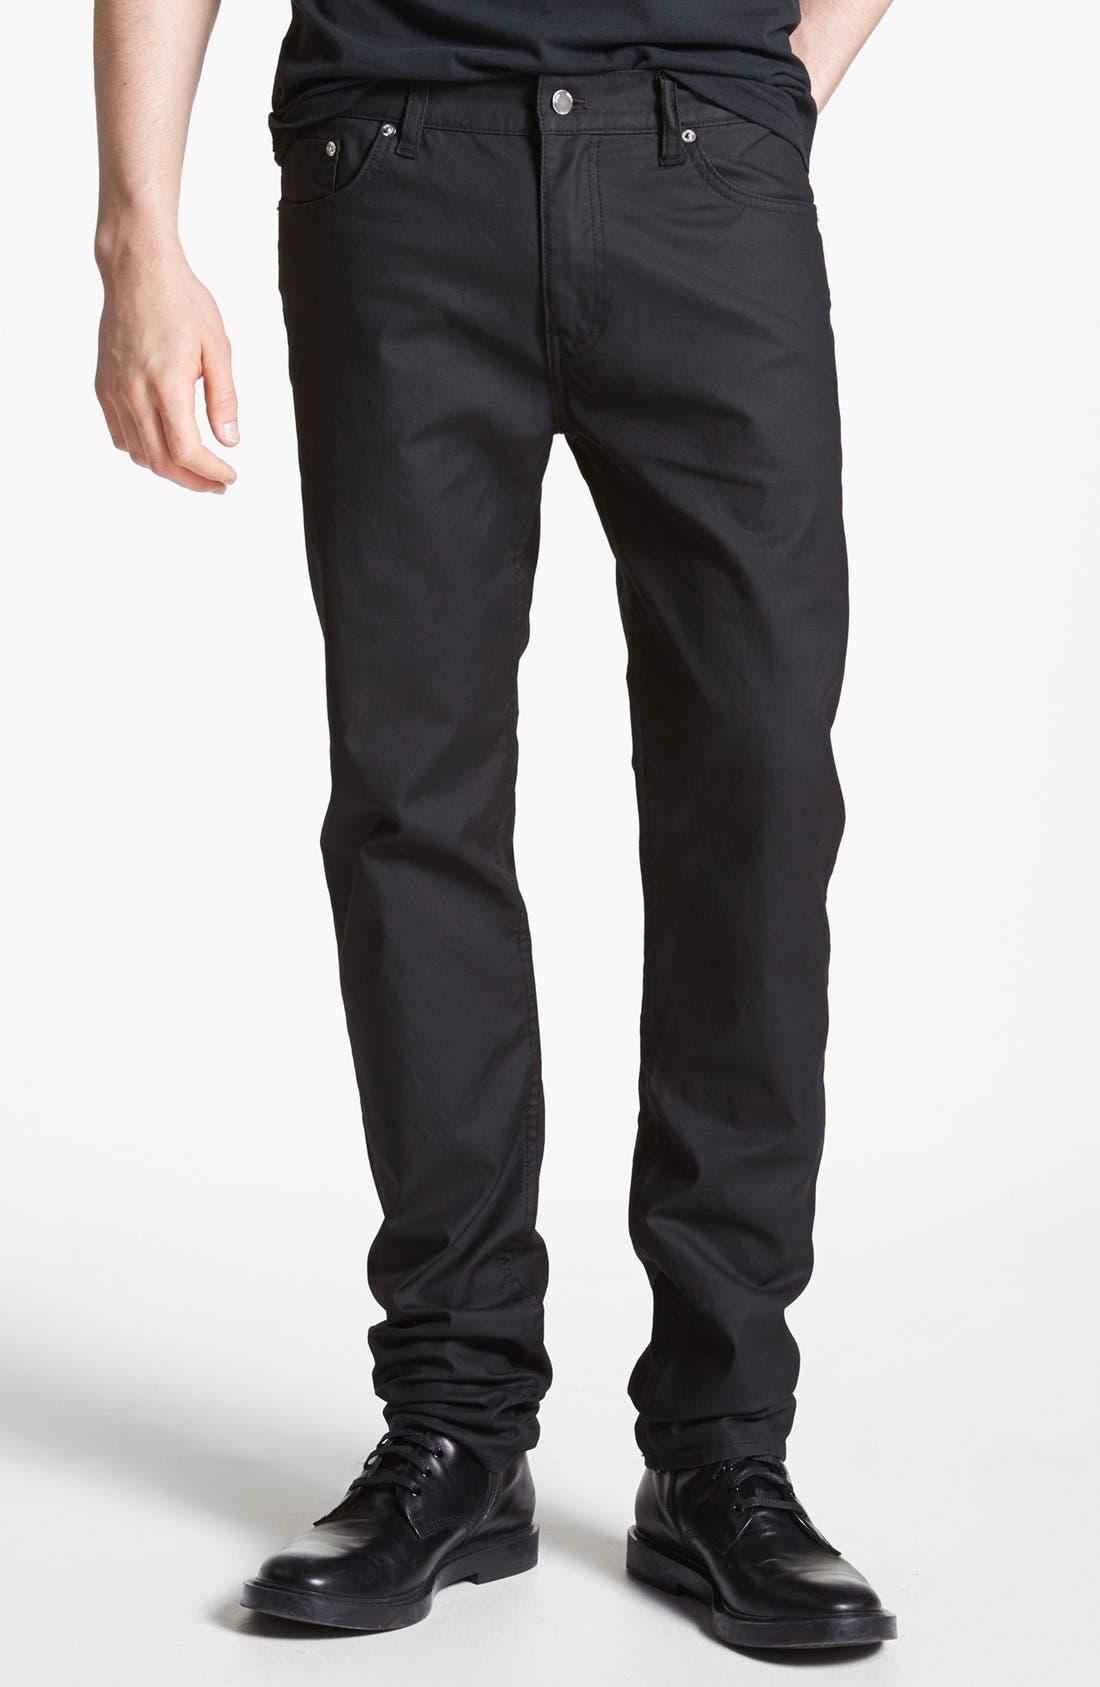 Main Image - BLK DNM 'Jeans 5' Slim Straight Leg Jeans (Orchard Black)